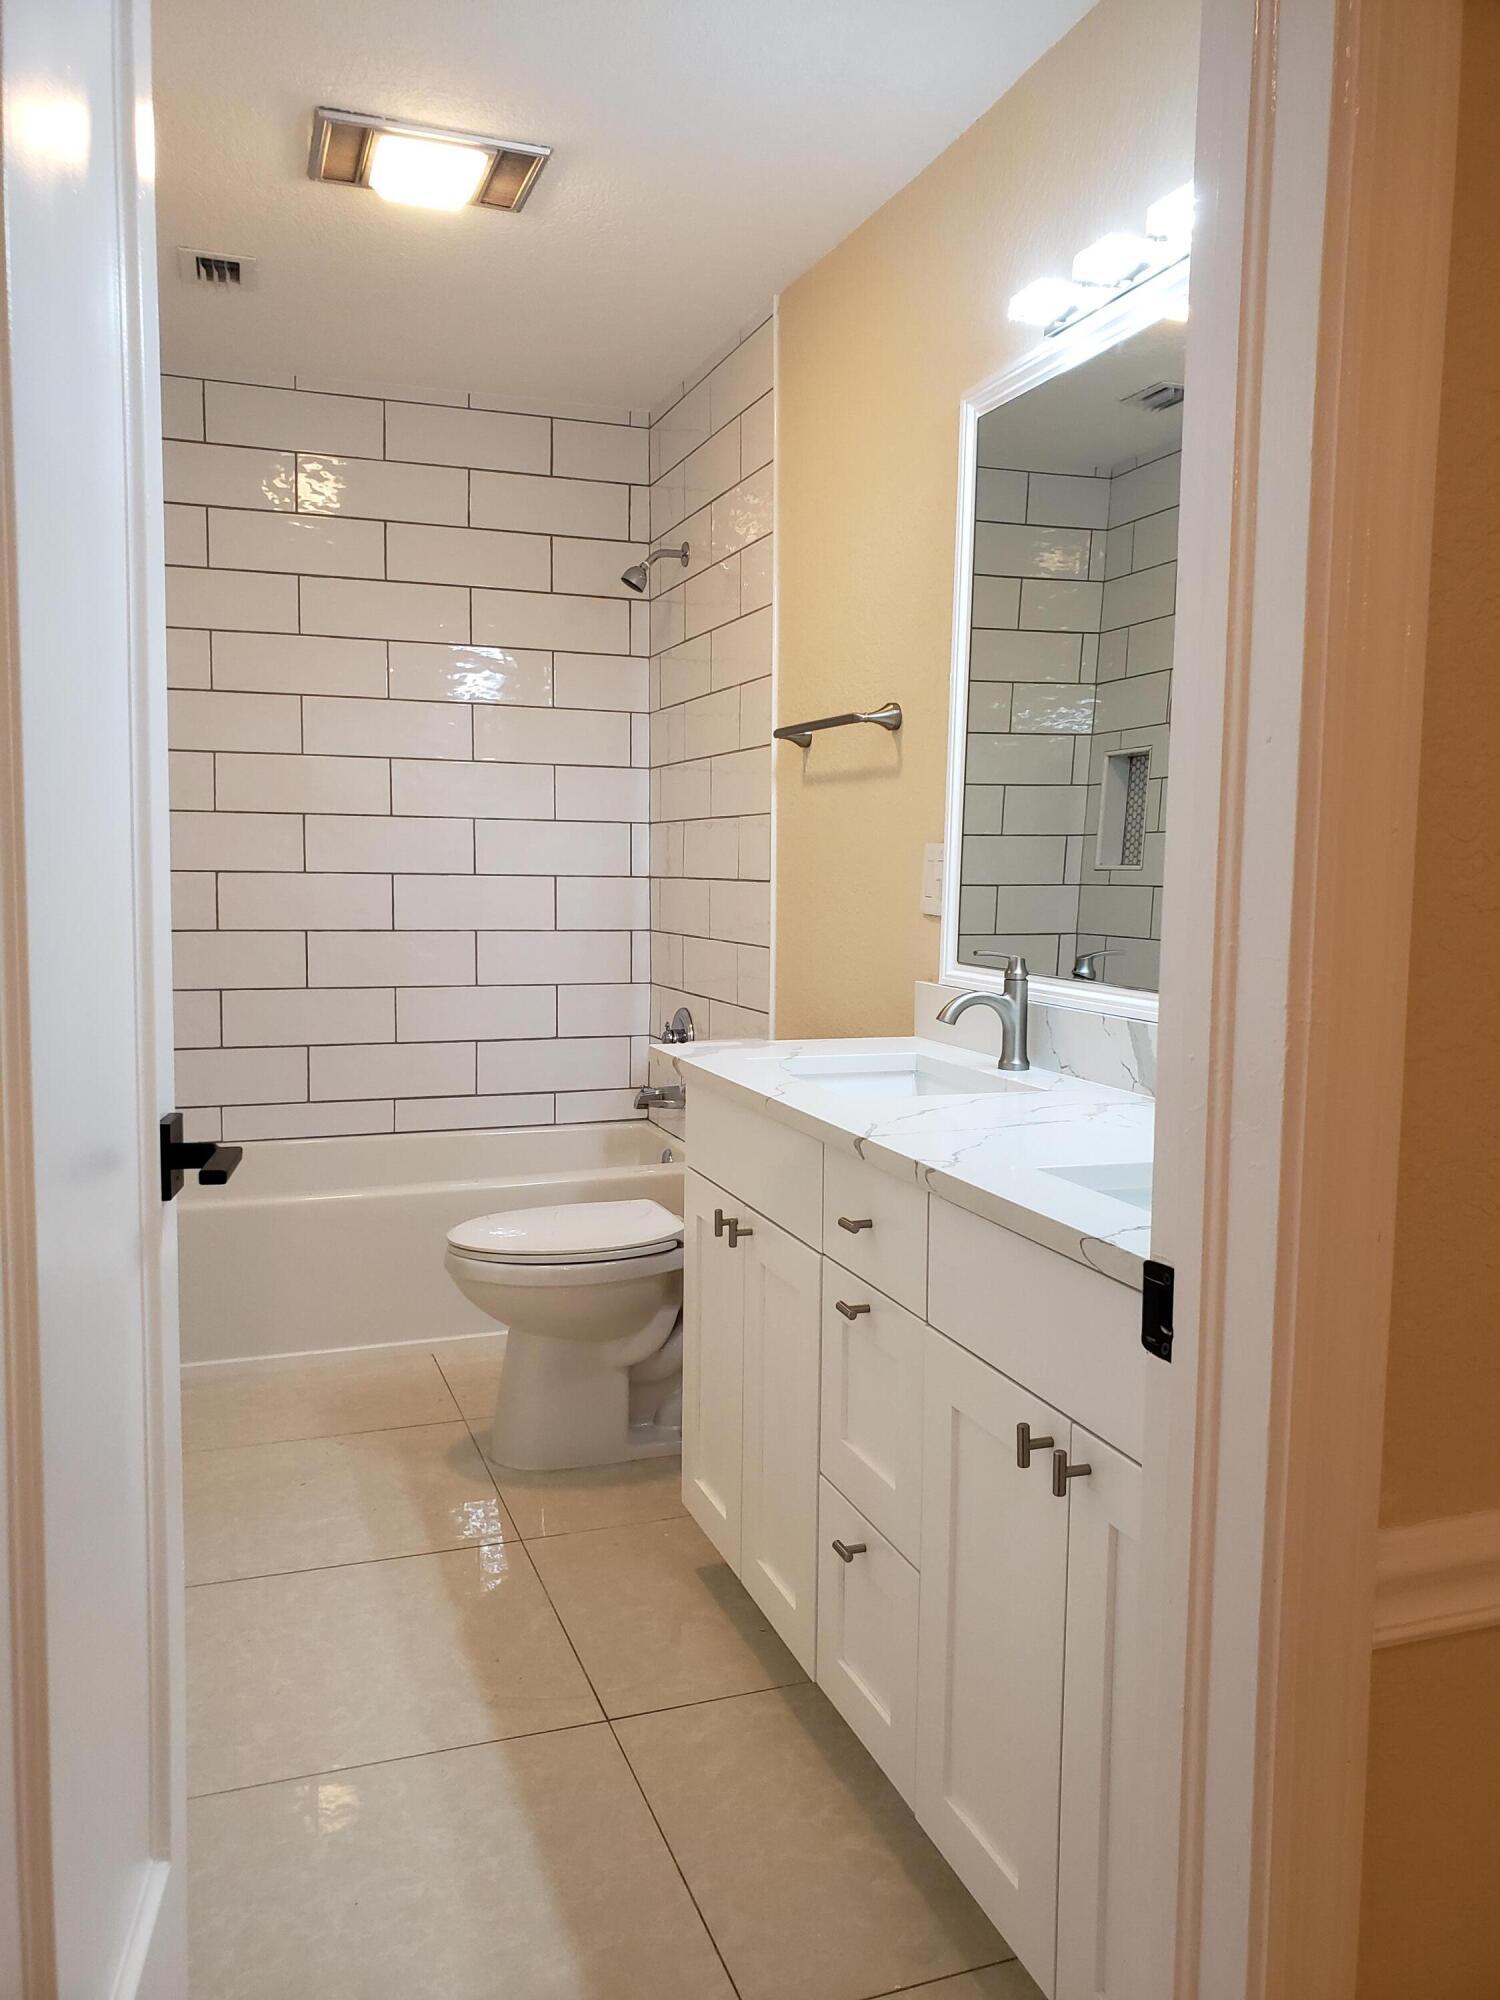 Kids Bath, New Tub,Cabinets